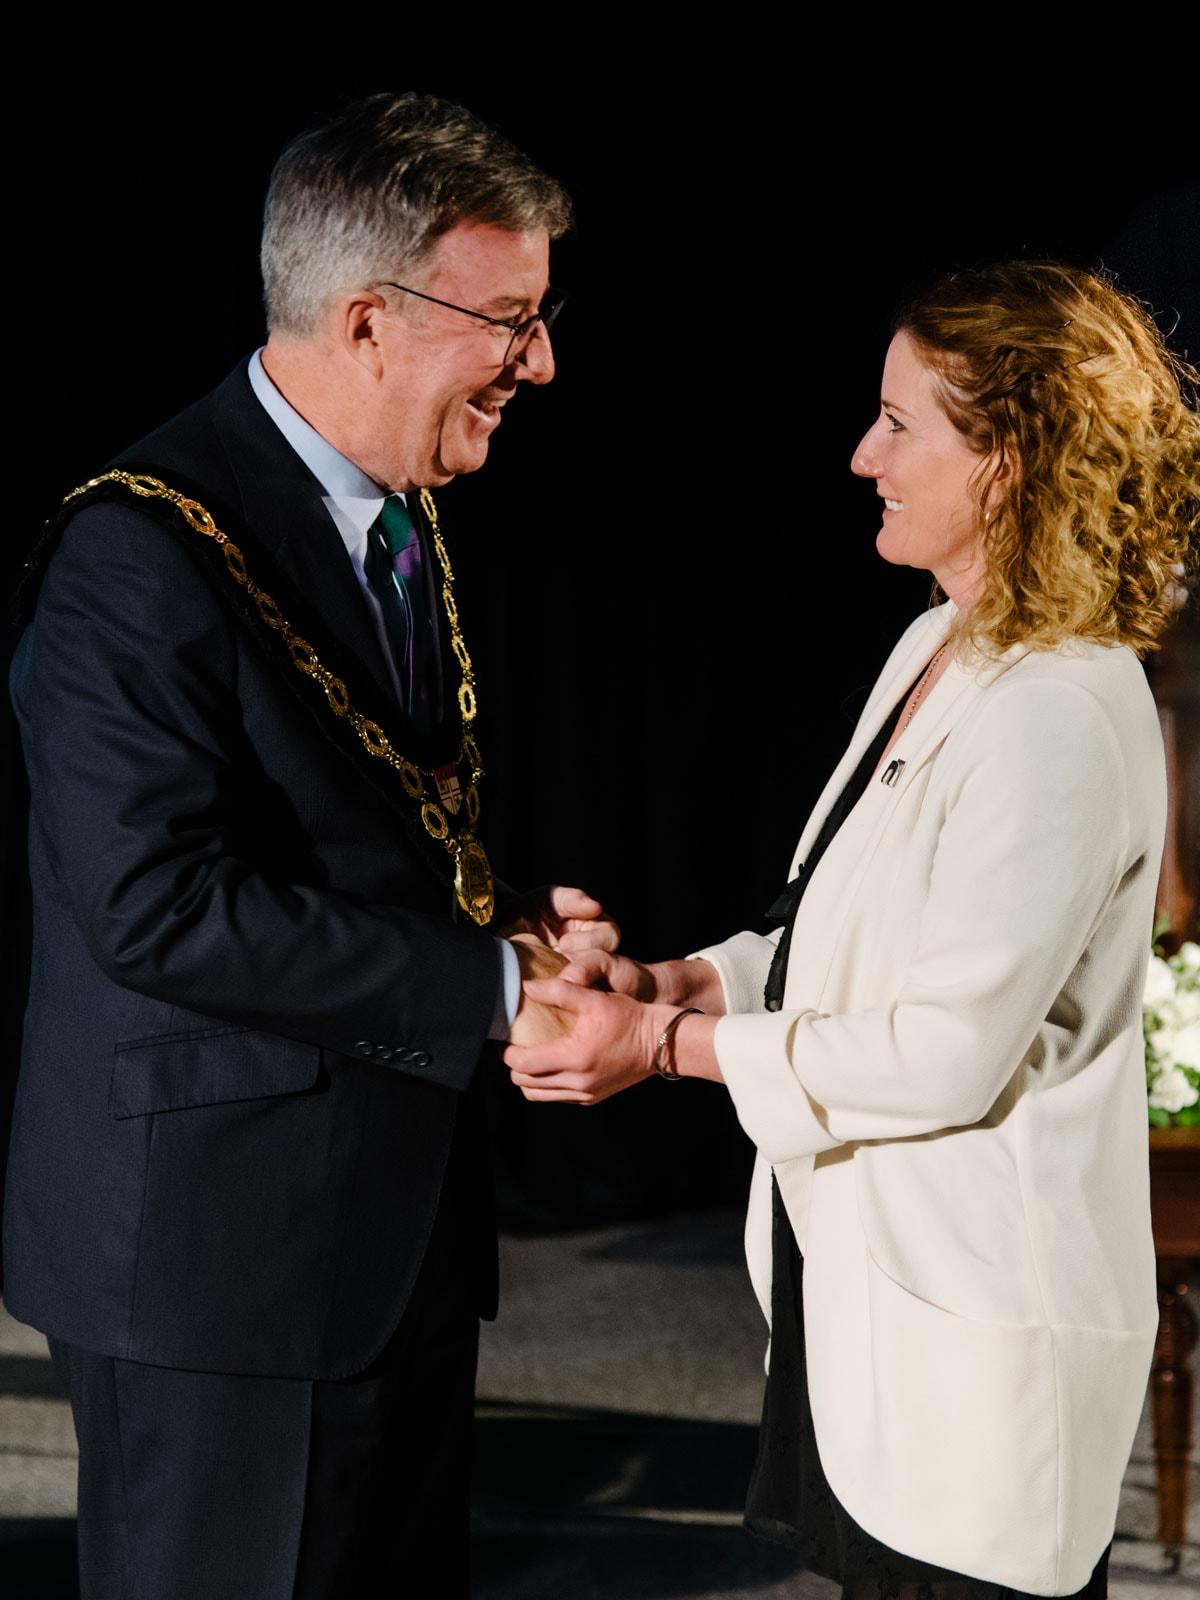 2019 Order of Ottawa induction ceremony. Photo credit: City of Ottawa